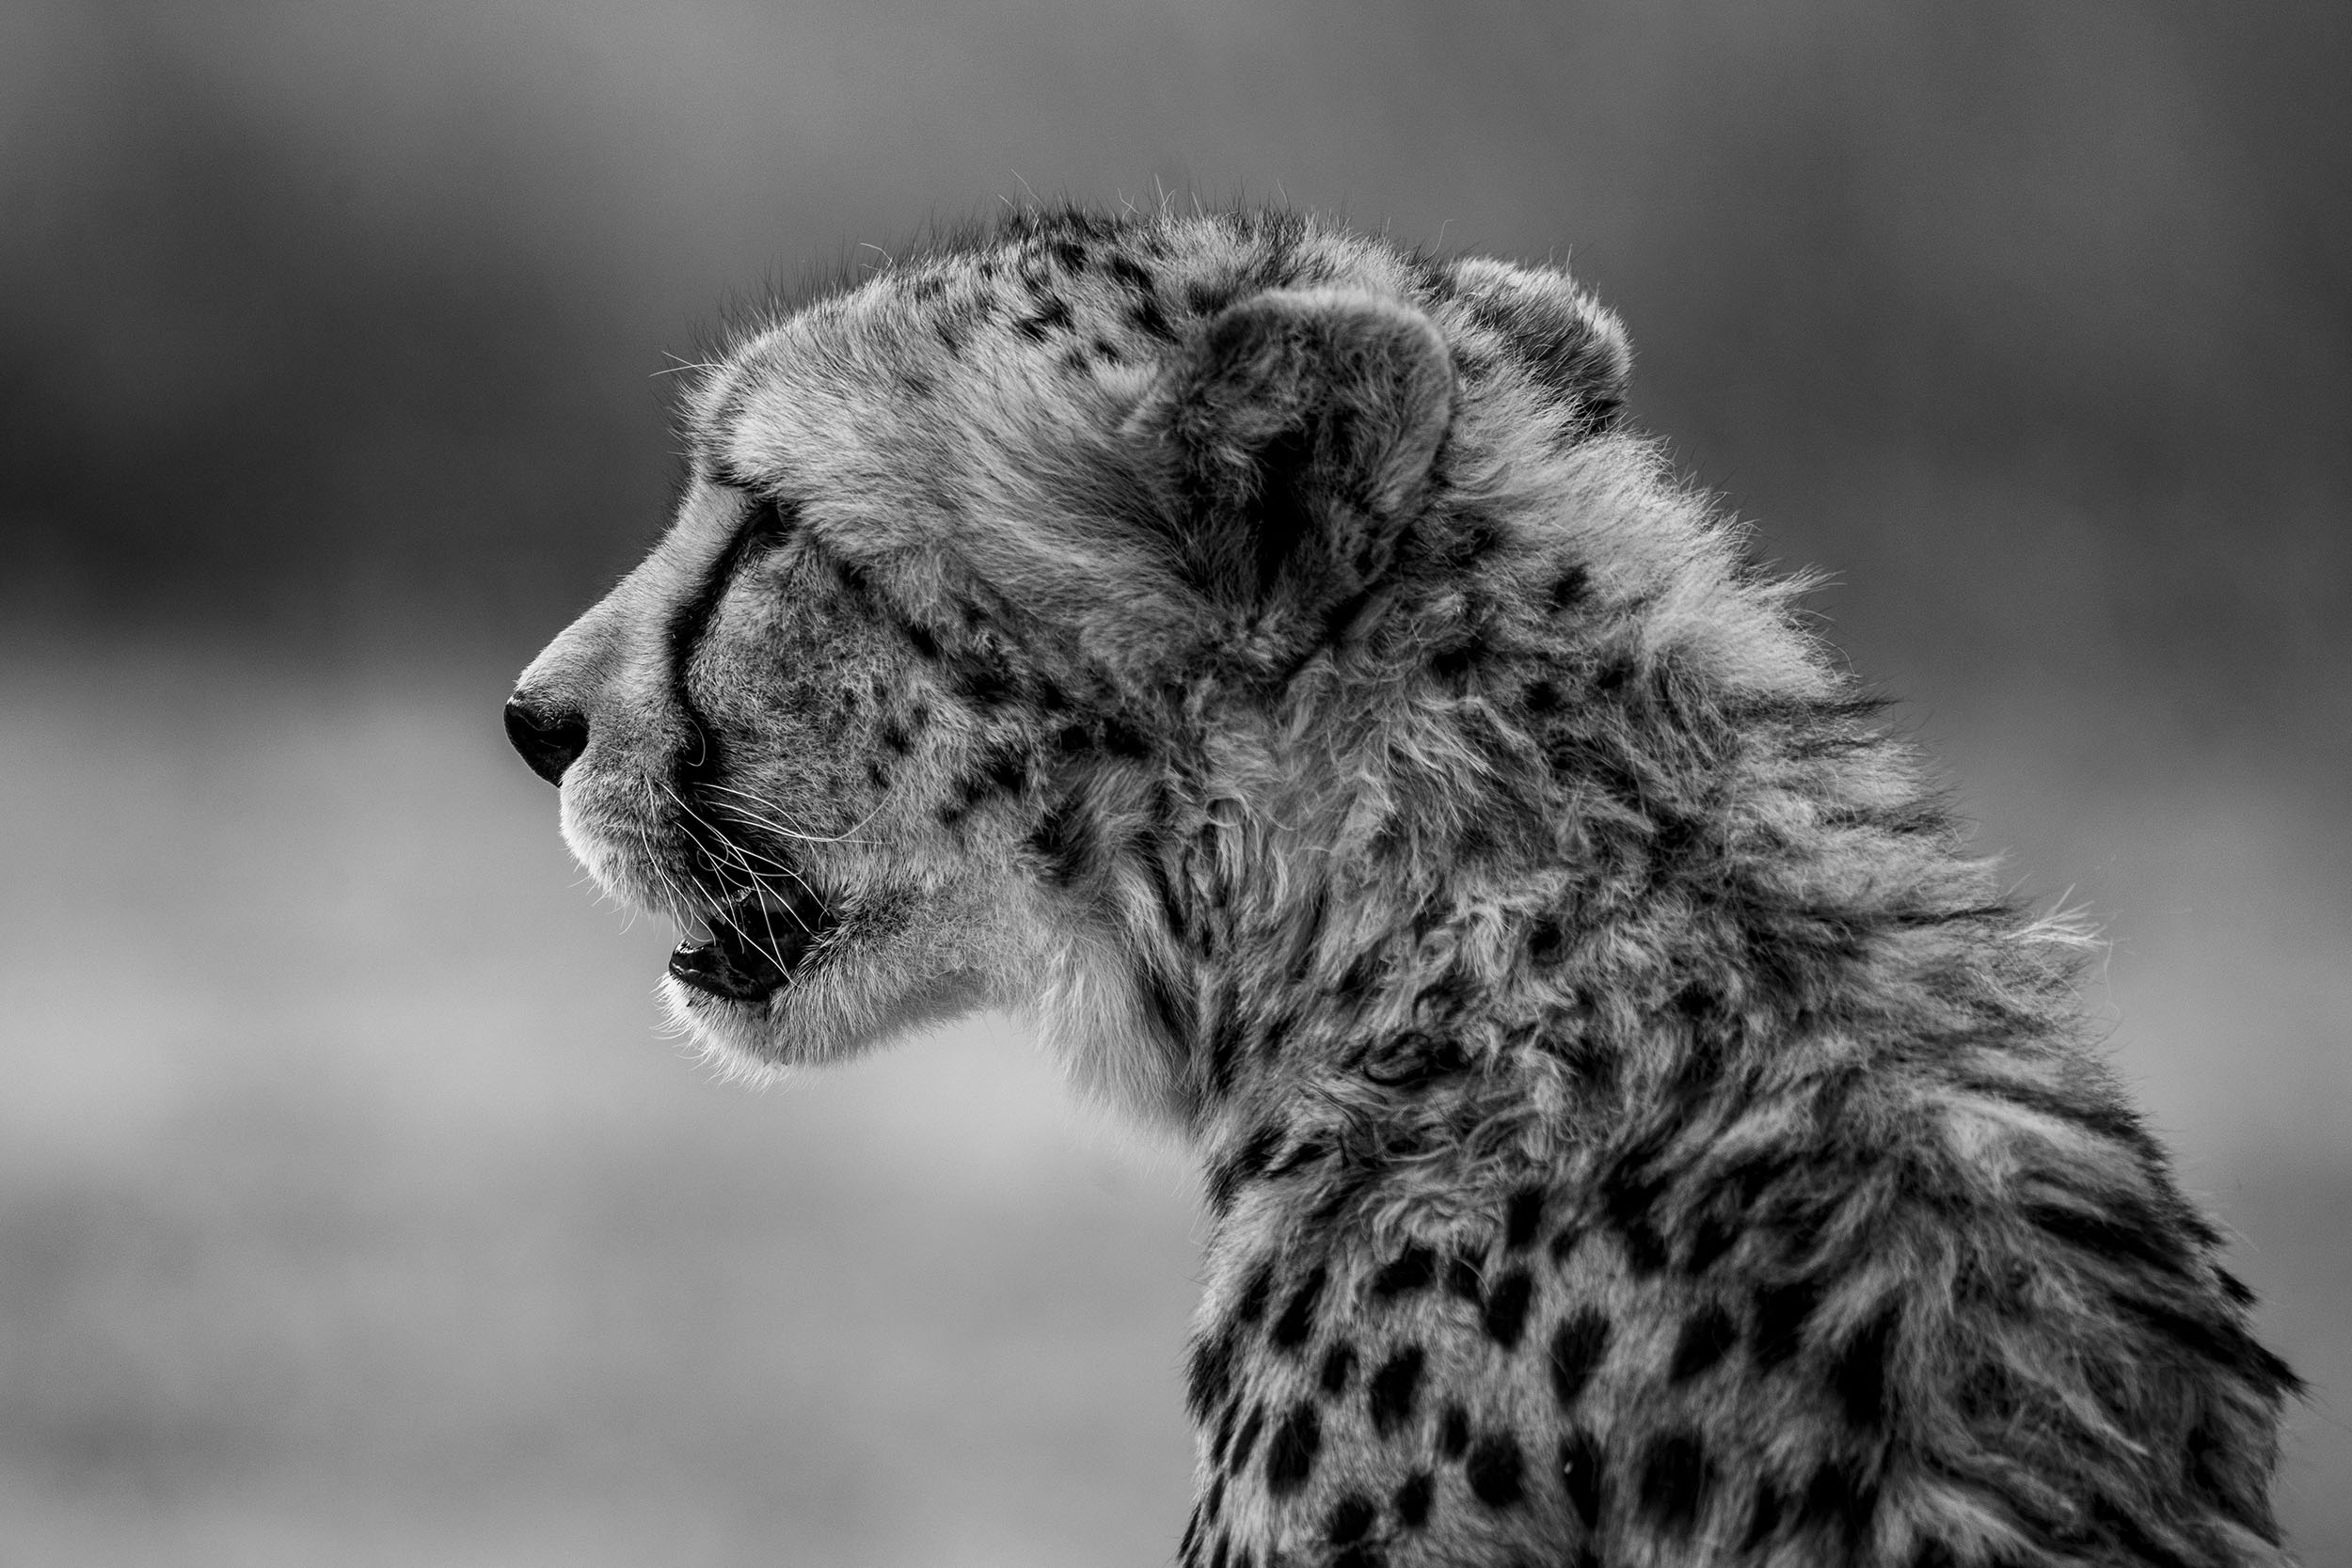 Cheetah - Fine Art Photography Print